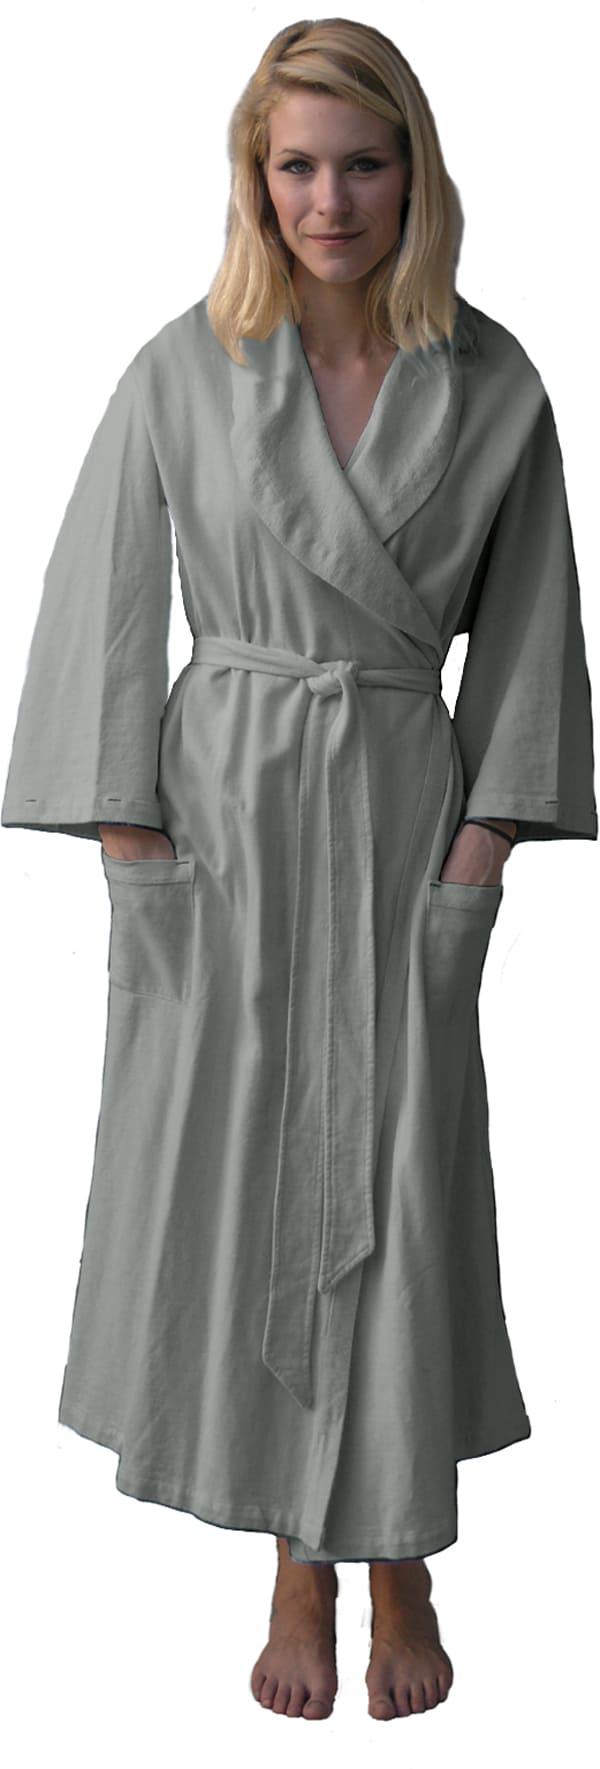 Moon Hemp Spa Robe